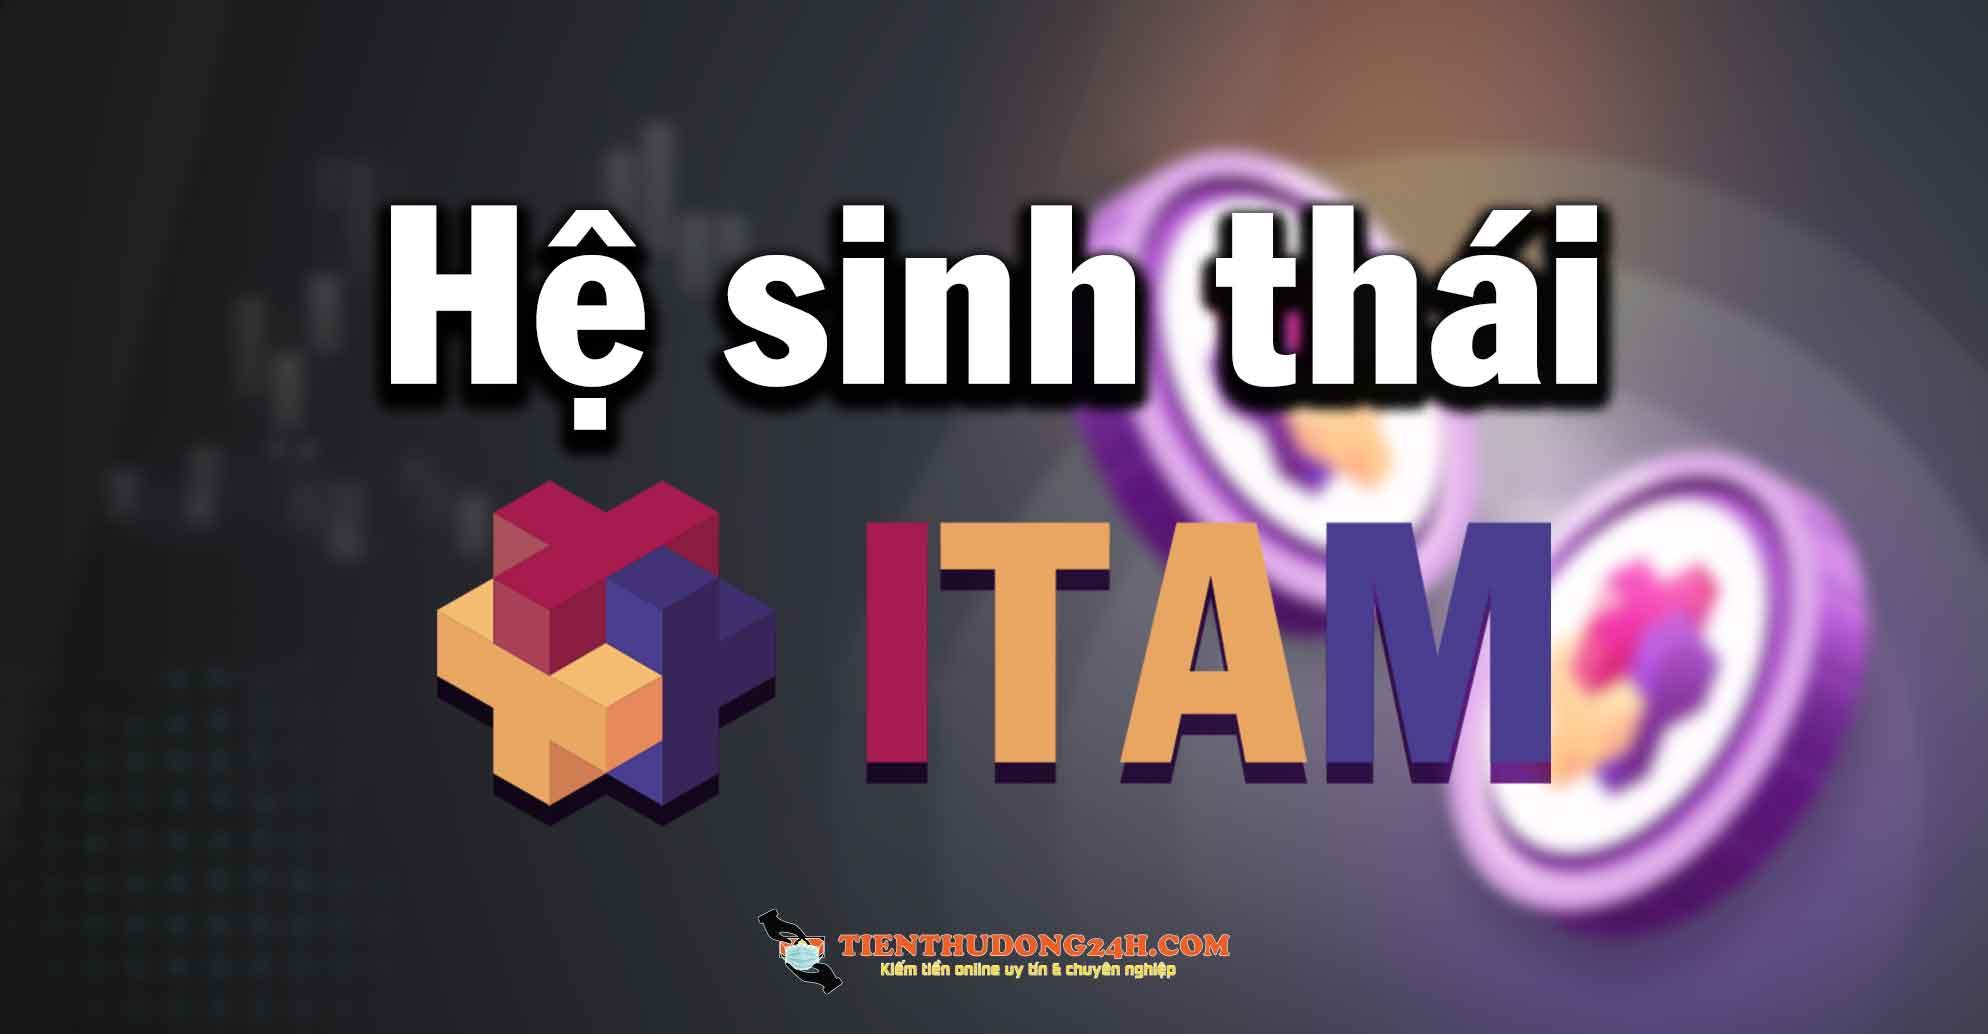 Hệ sinh thái ITAM